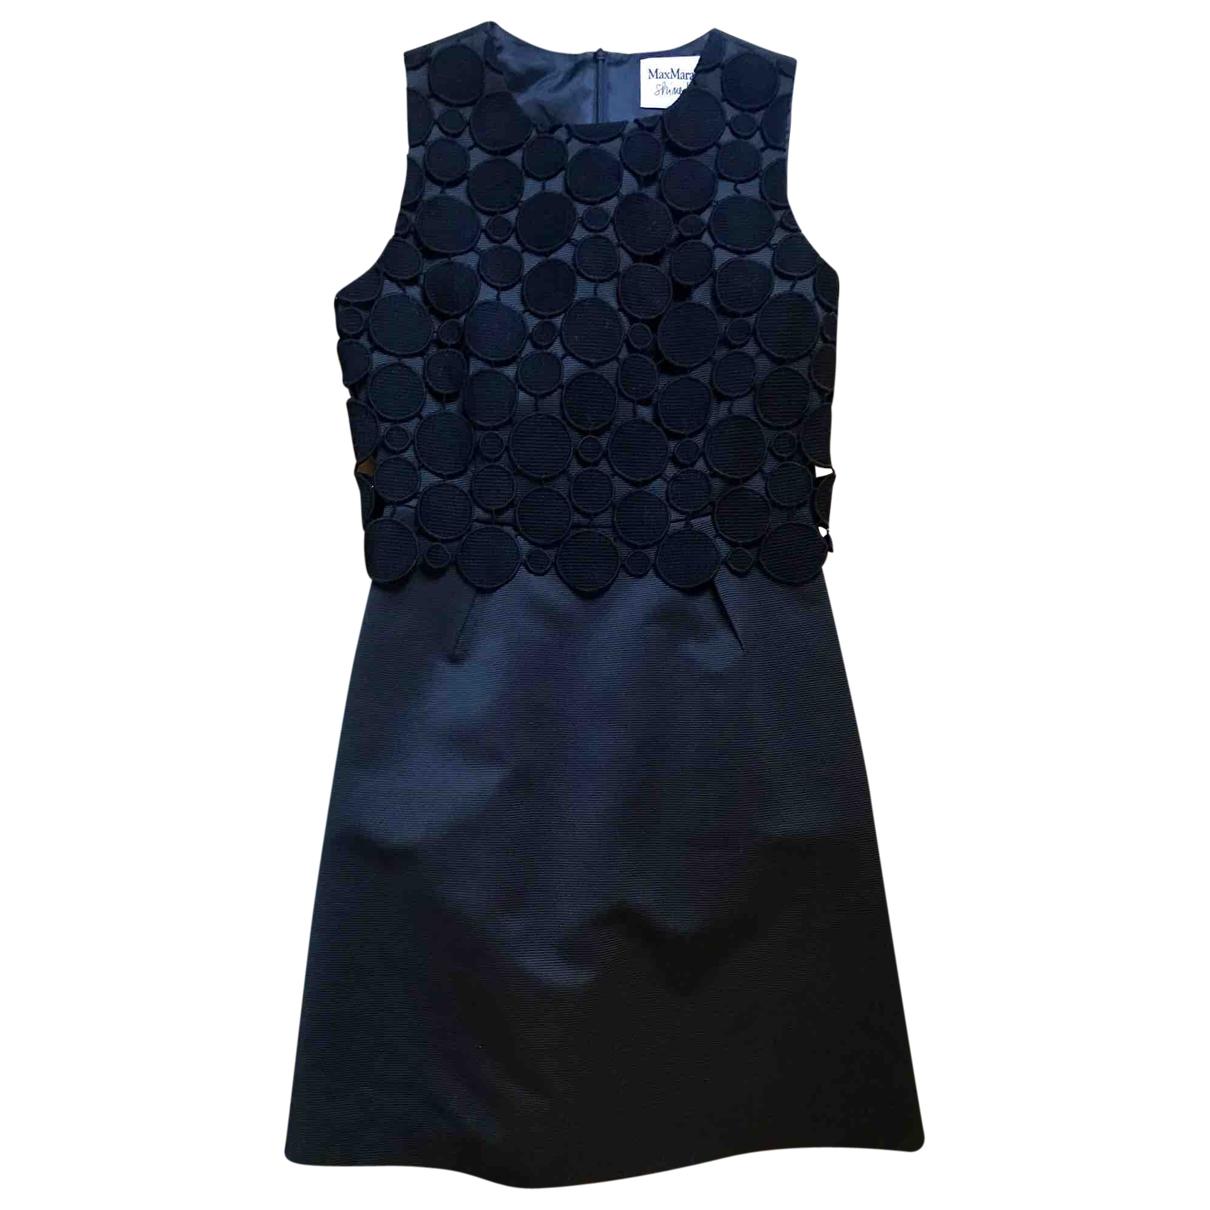 Max Mara \N Kleid in  Schwarz Baumwolle